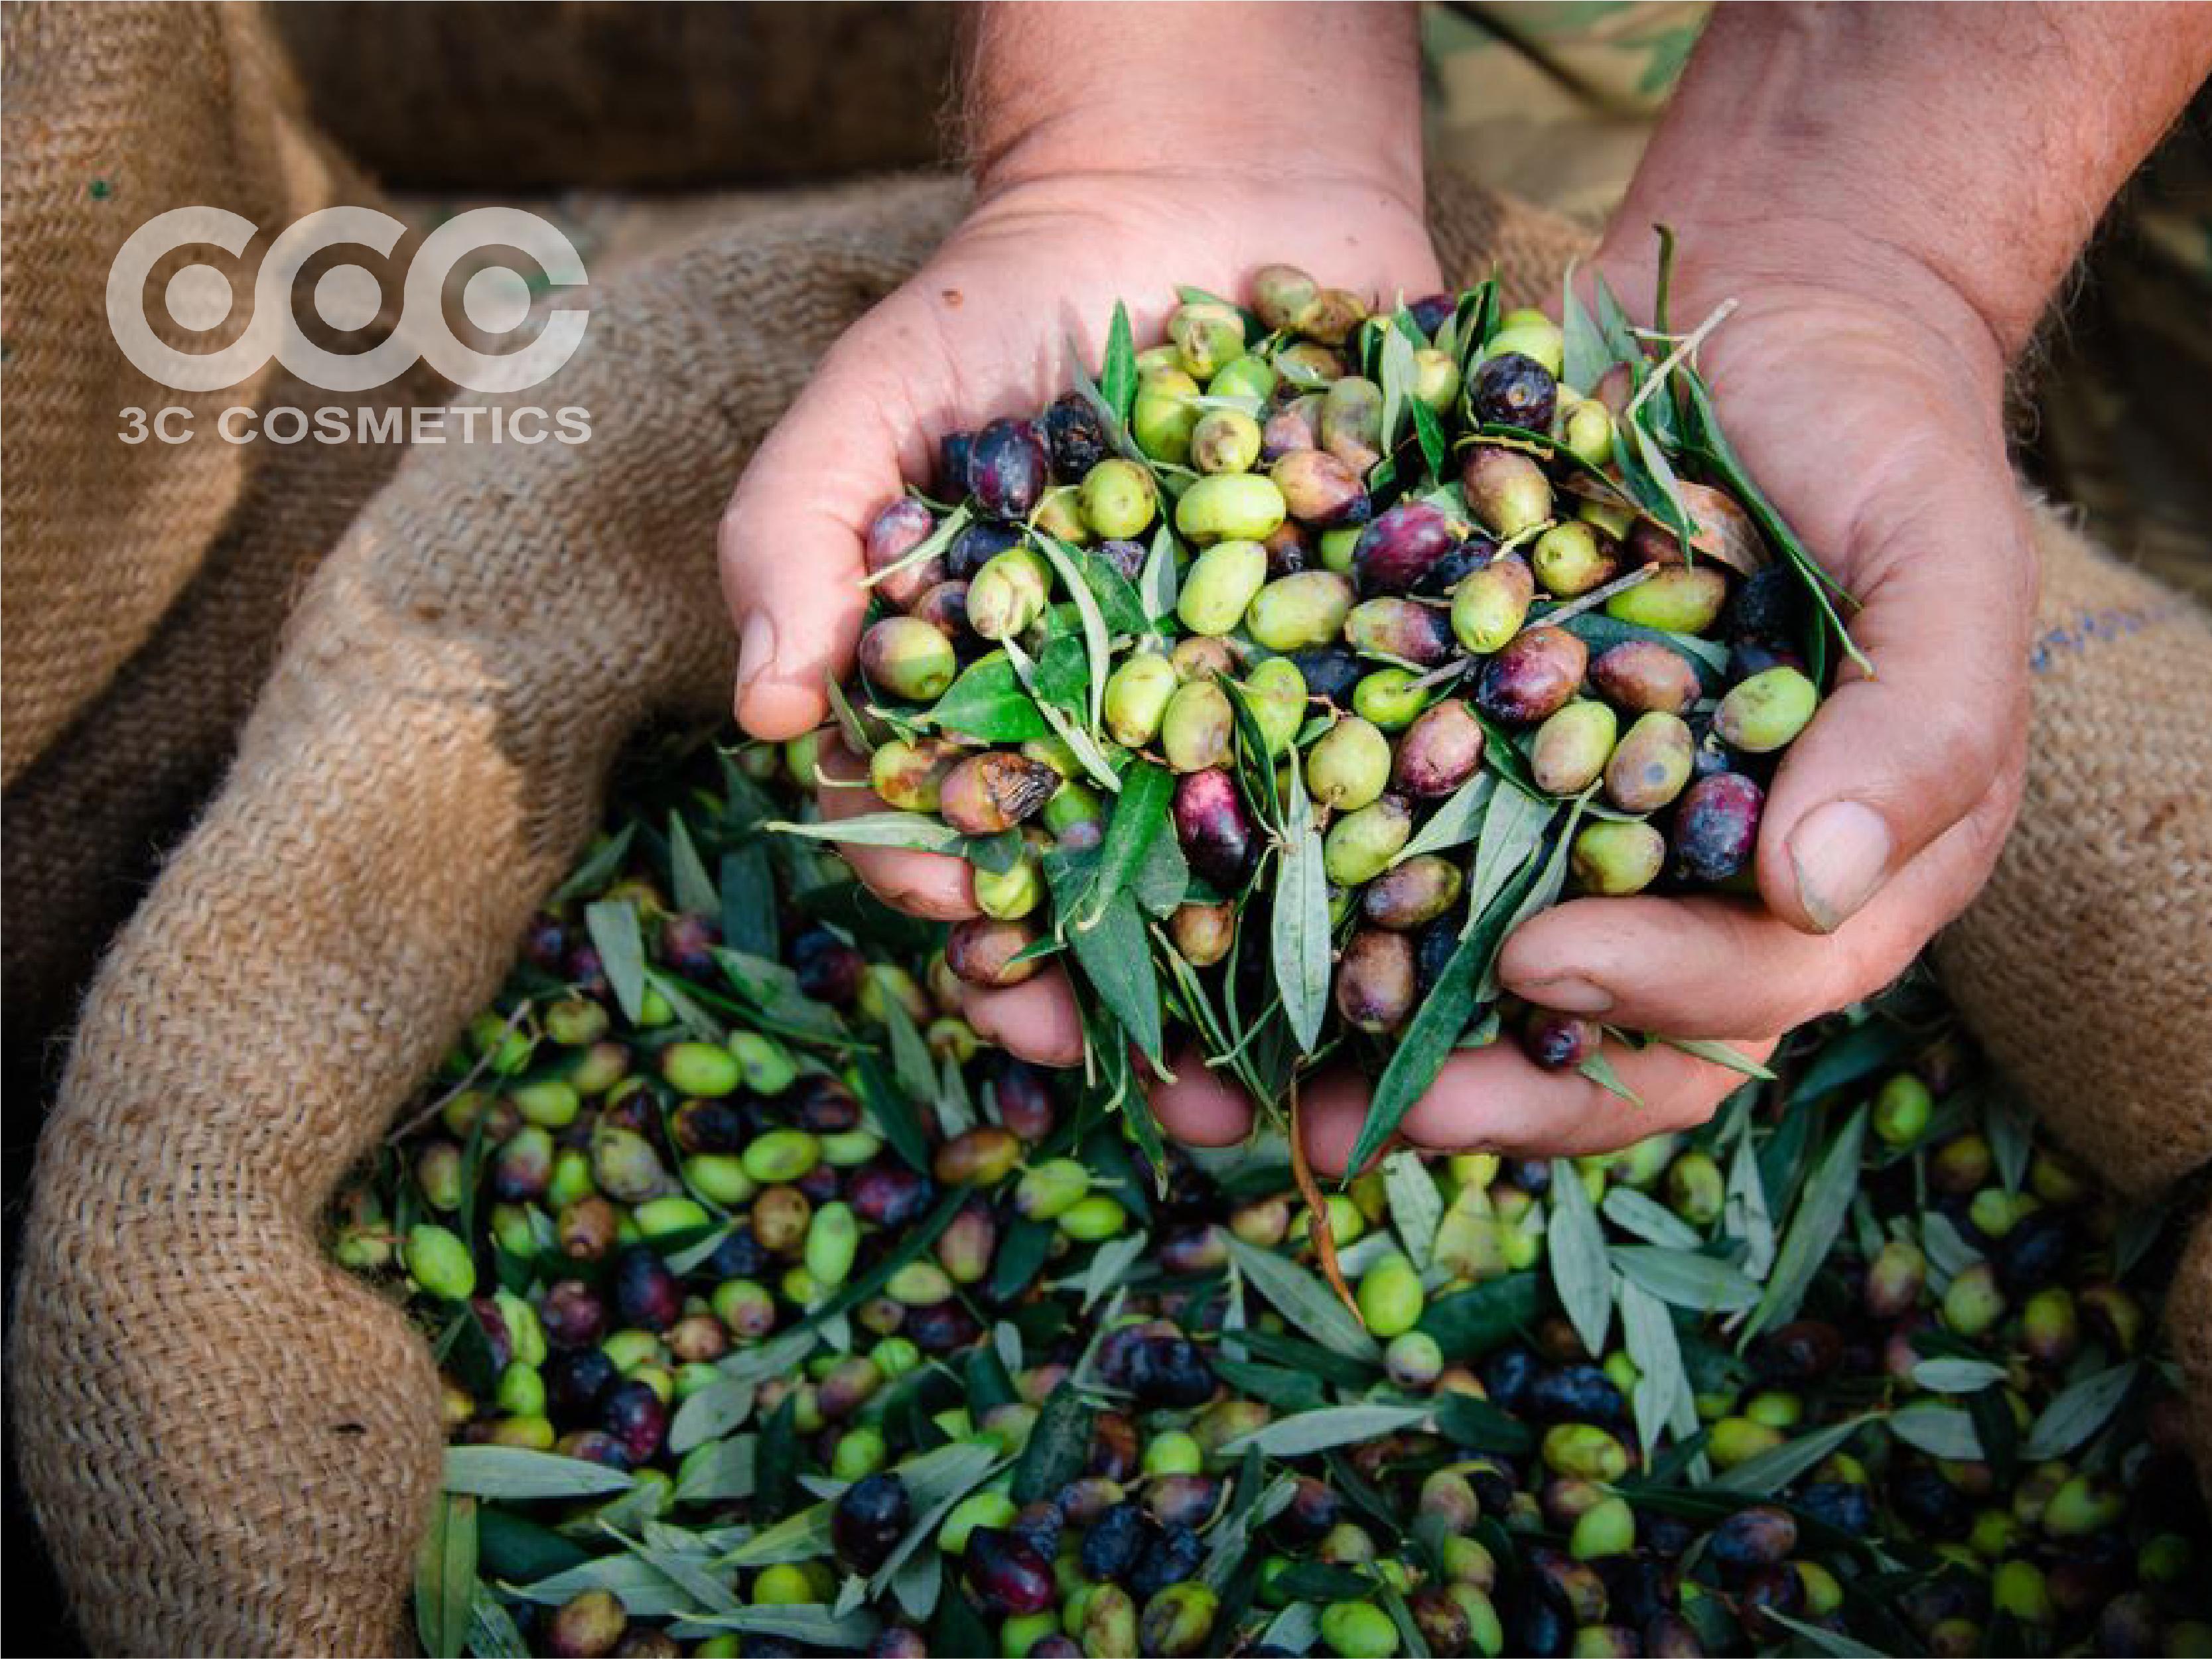 Dầu oliu được chiết xuất từ quả oliu